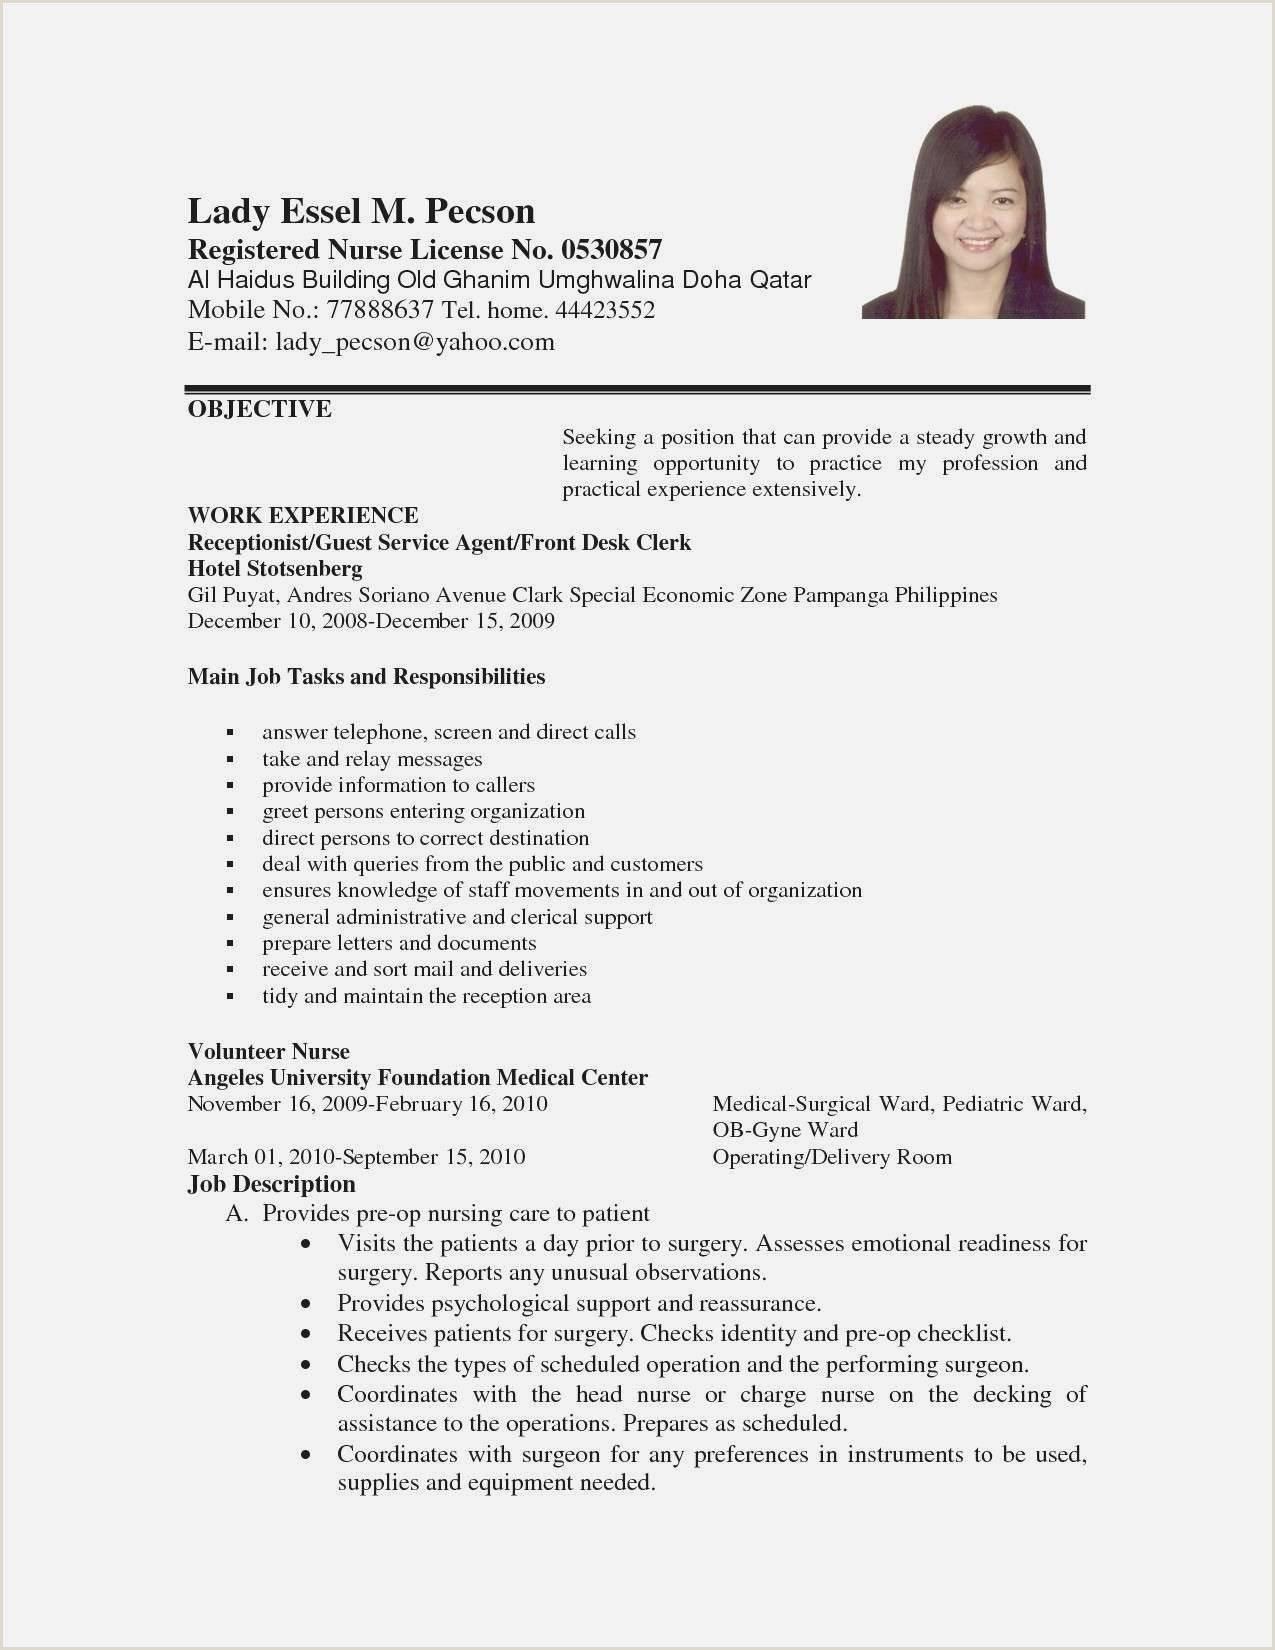 Cv Gratuit original Meilleur De Fresh Blank Resume format